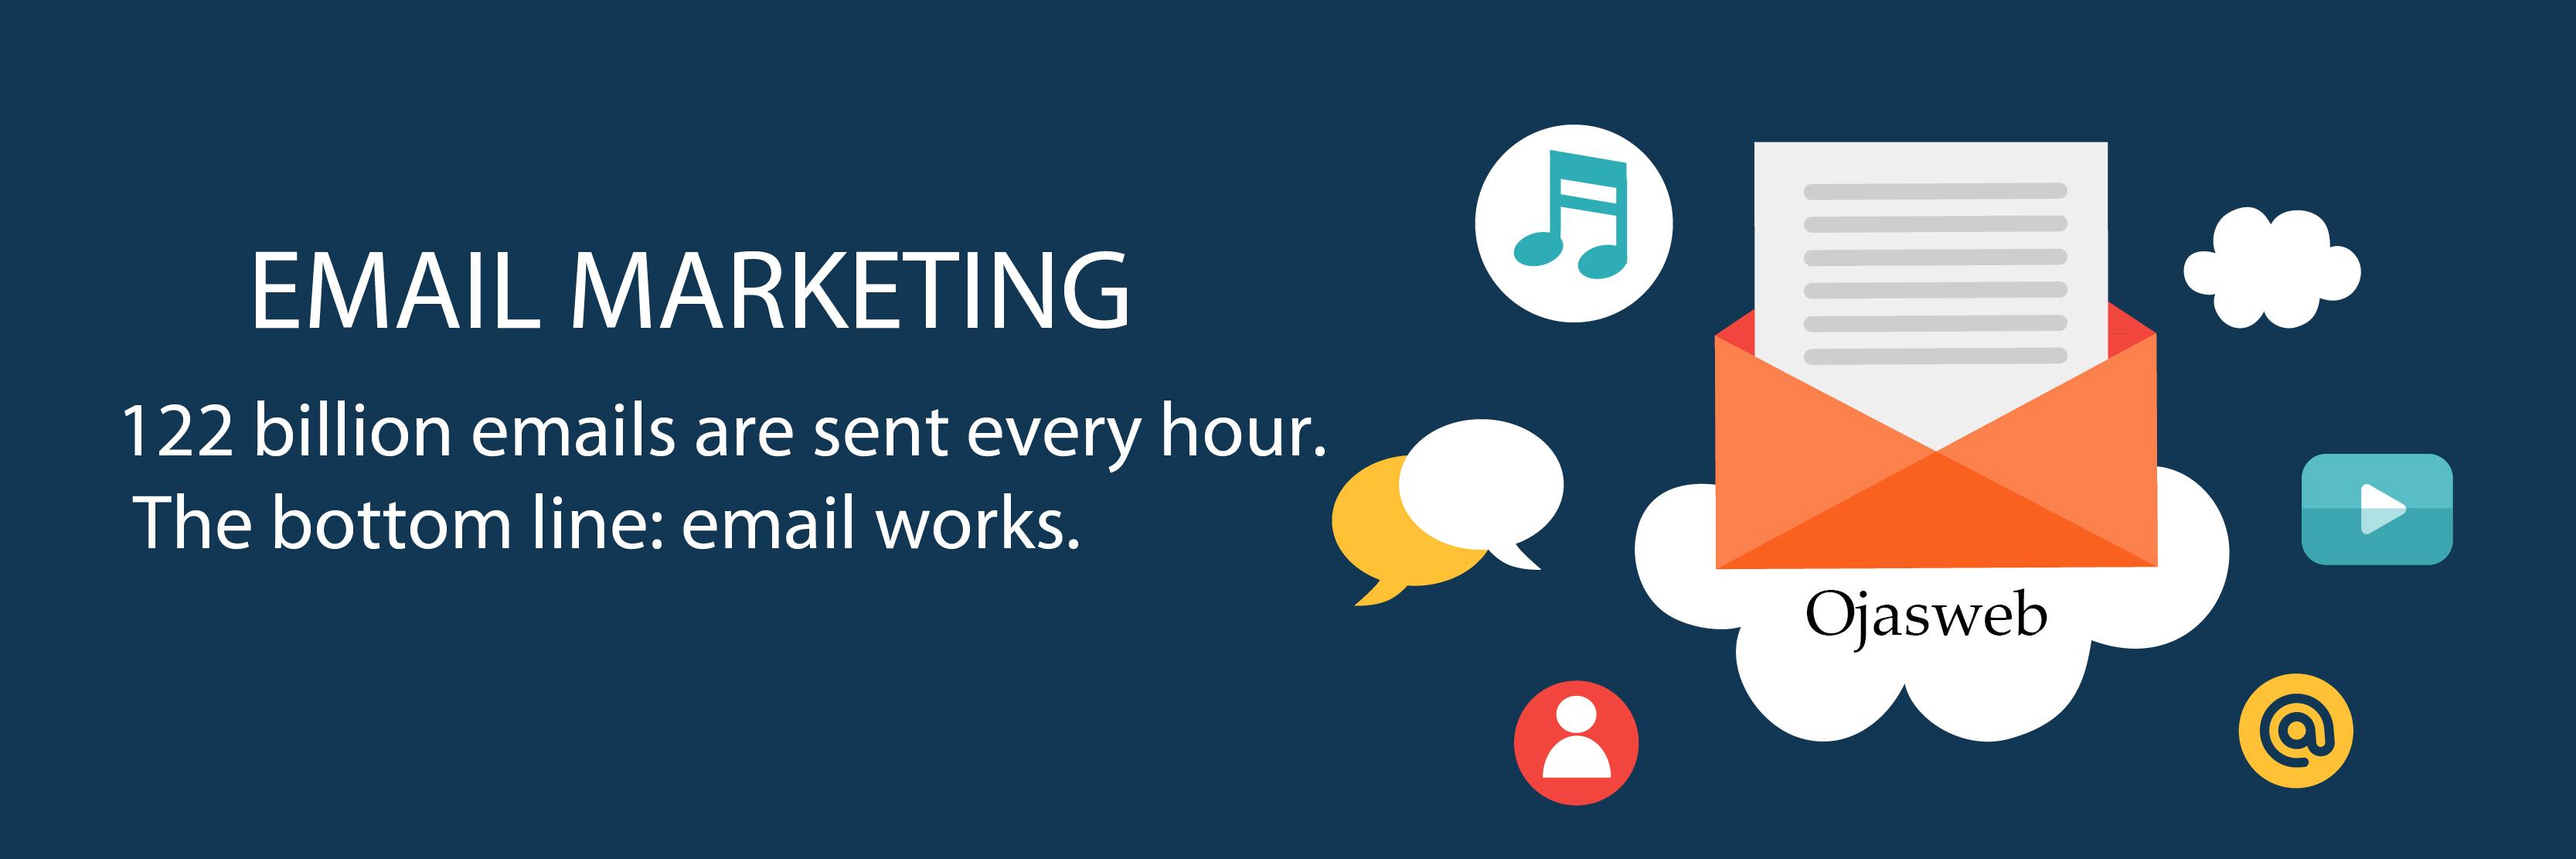 ojasweb email marketing training